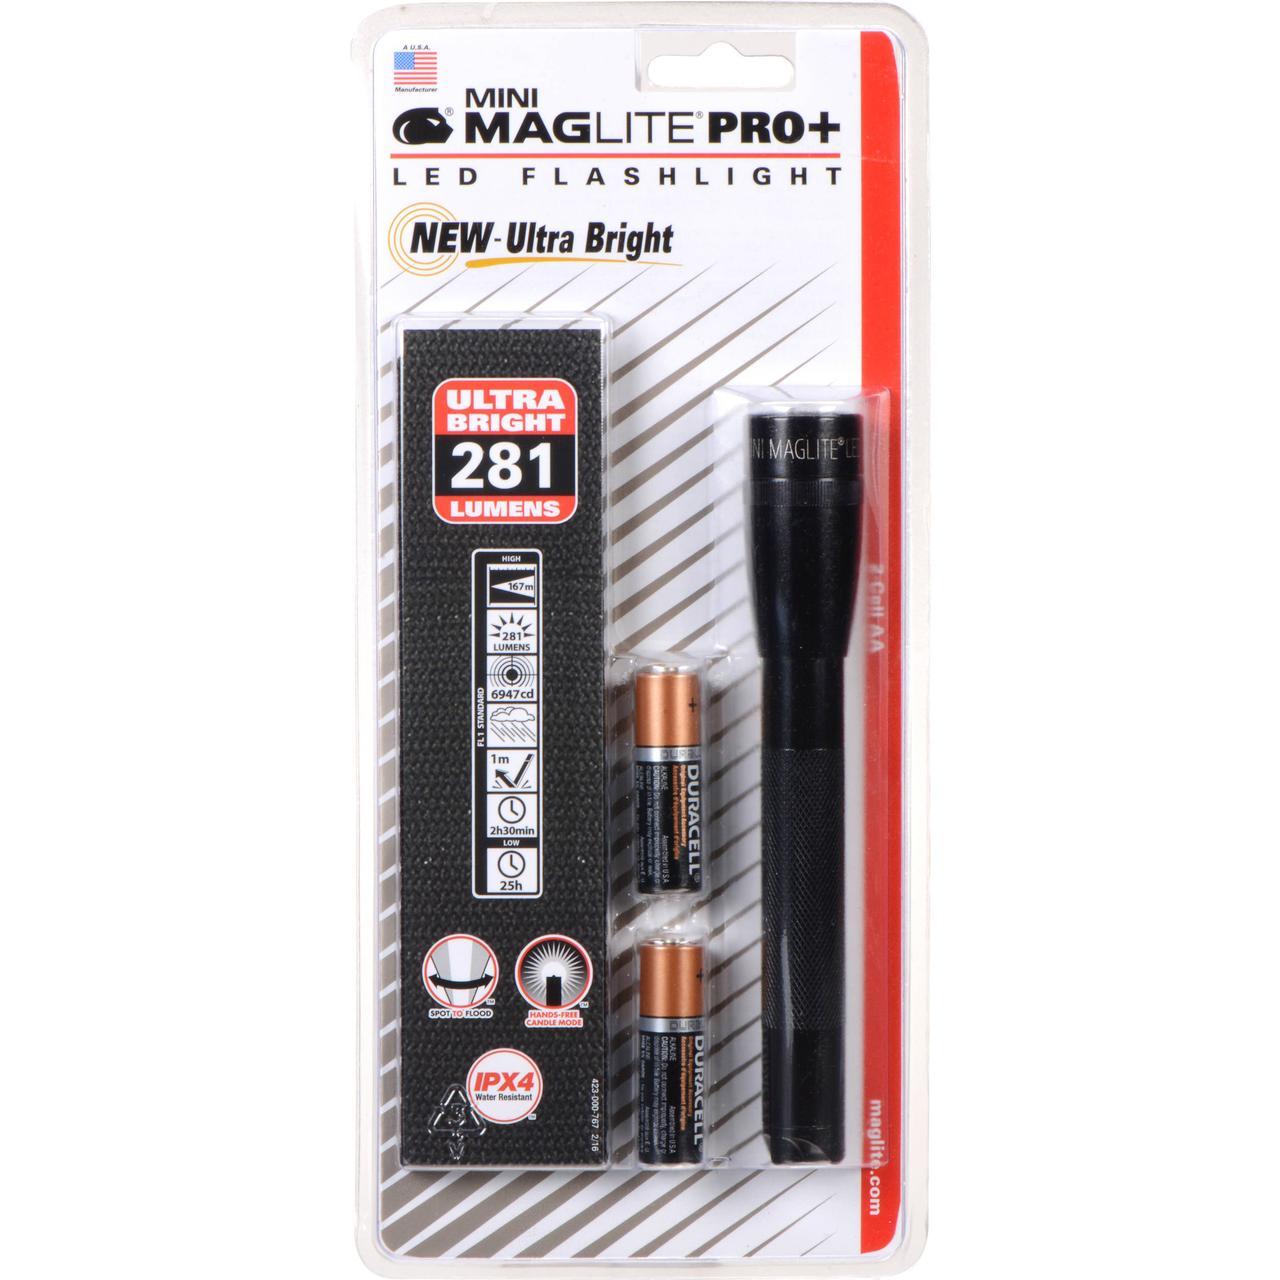 Фонарь MINI MAGLITE LED PRO+ 2xAA (245 Lum)(с 2-мя батарейками и чехлом)(черный)(в блистере) R34640